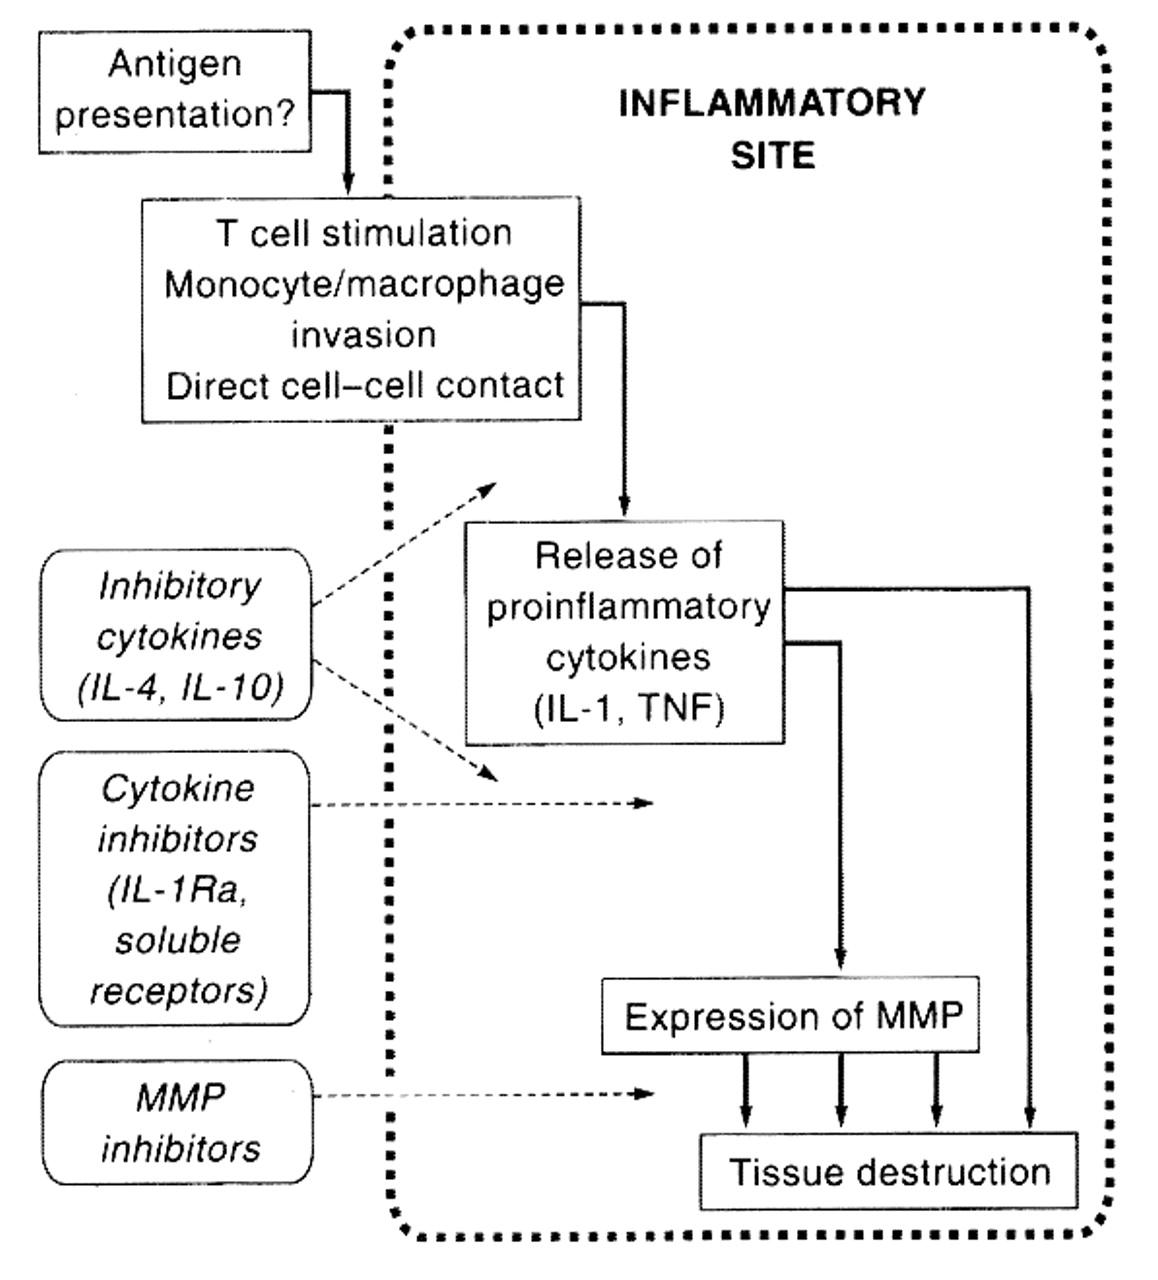 Inhibitory cytokines and cytokine inhibitors   Neurology